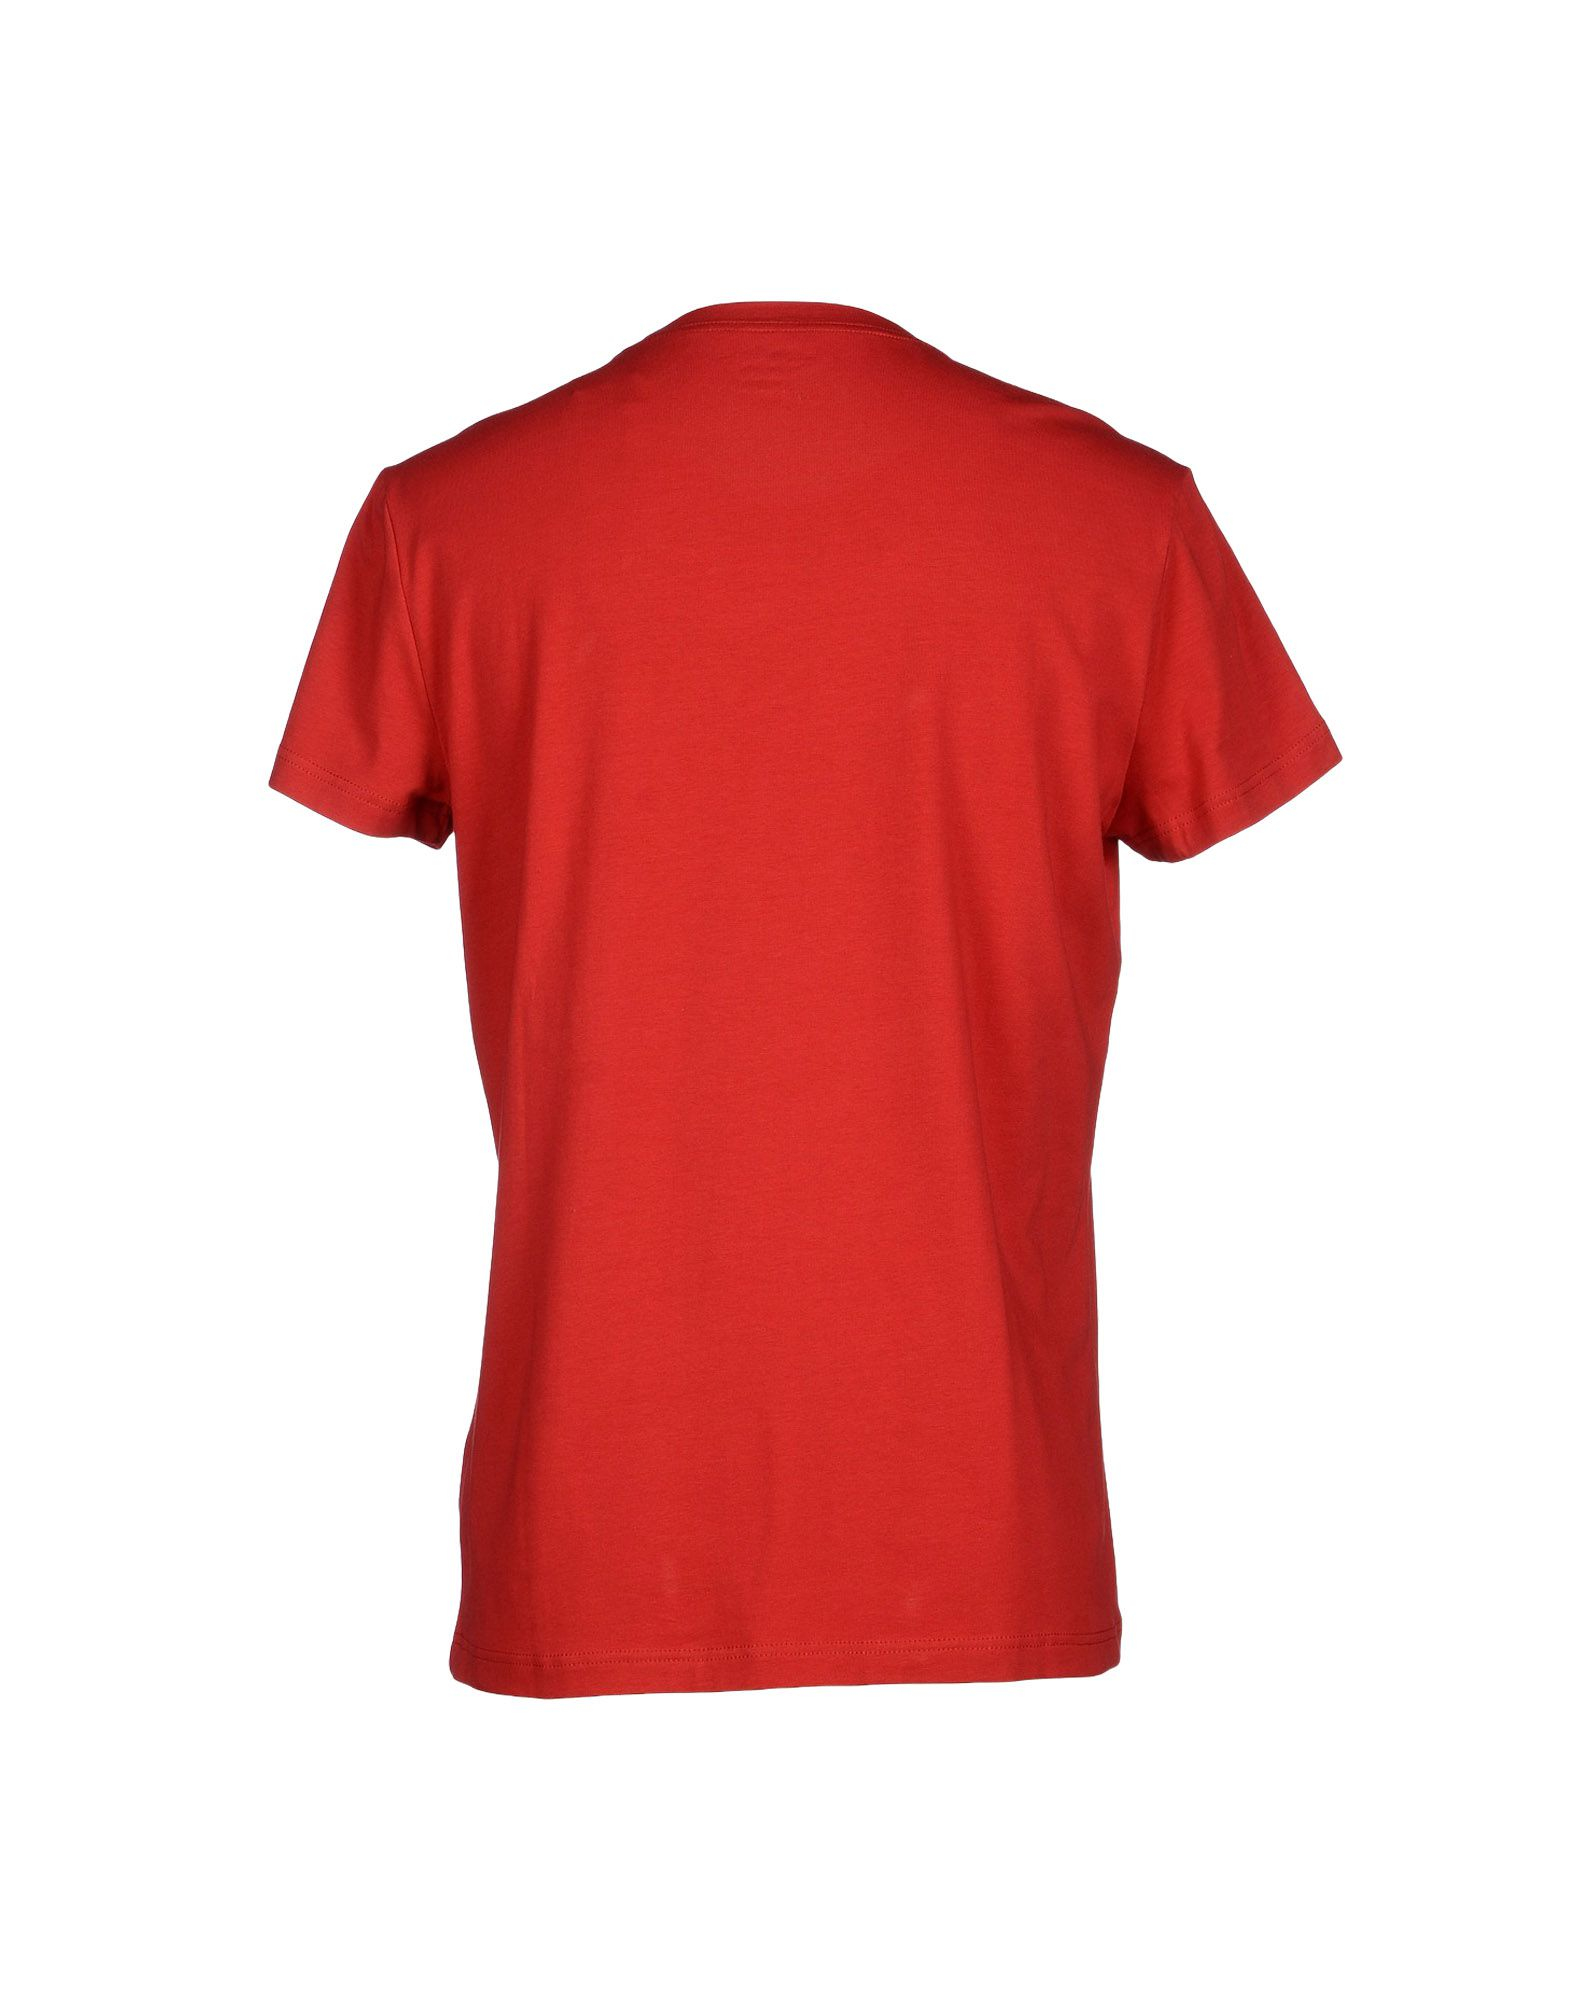 calvin klein jeans t shirt in red for men lyst. Black Bedroom Furniture Sets. Home Design Ideas